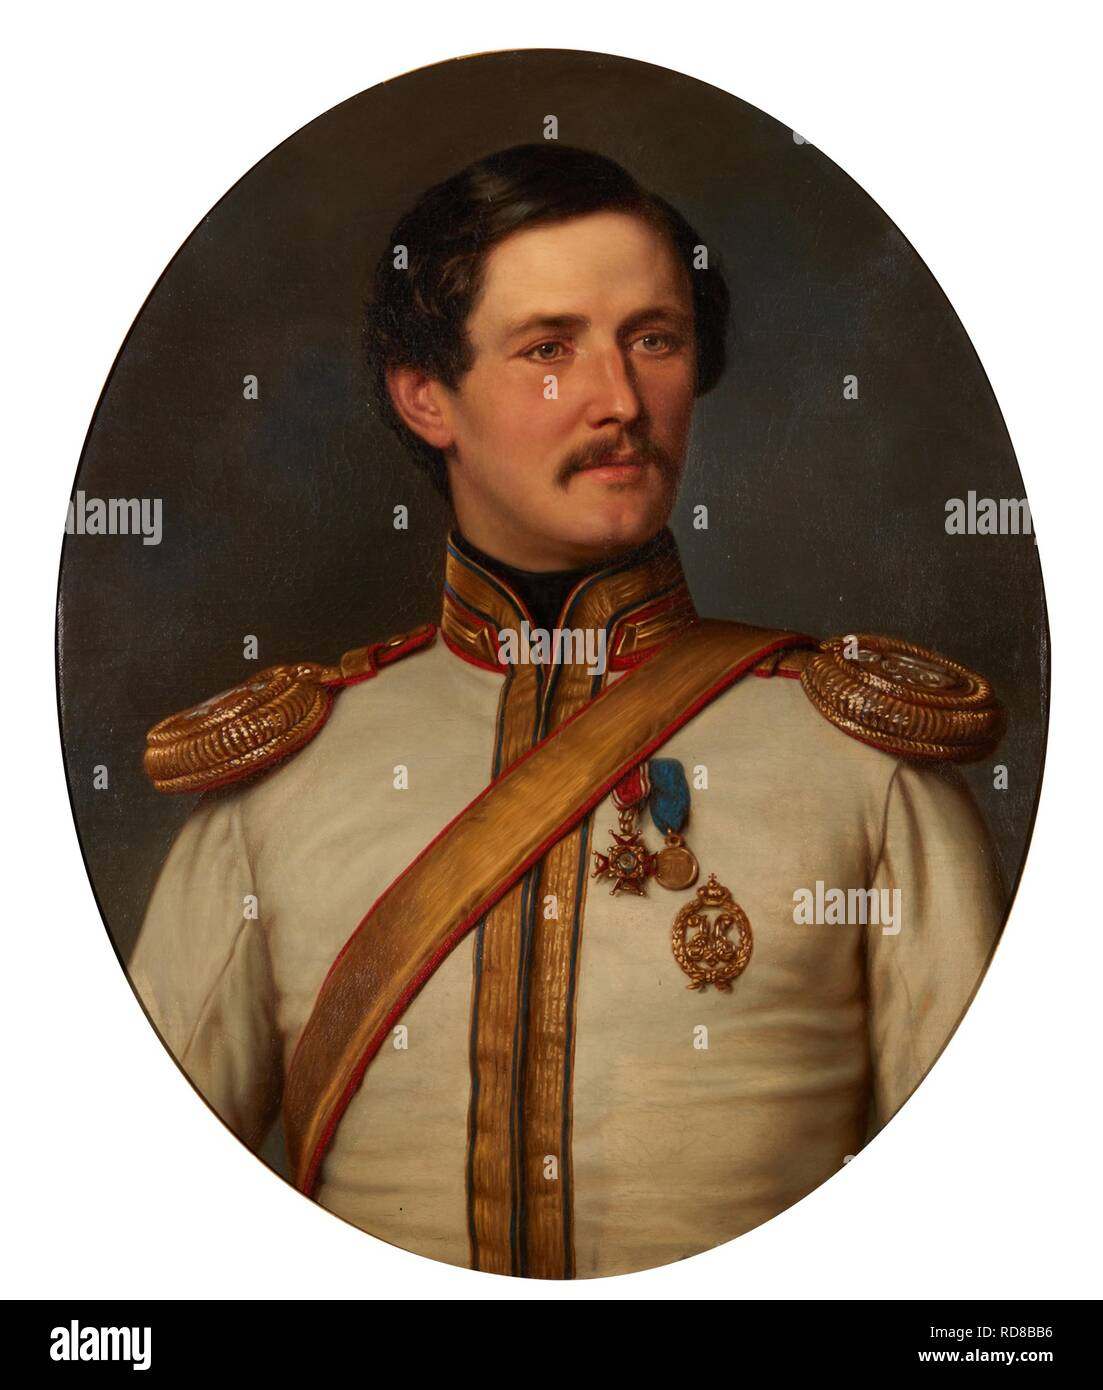 Peter Dominikus Ludwig (1831-1887), Prince of Sayn-Wittgenstein-Berleburg-Ludwigsburg. Museum: PRIVATE COLLECTION. Author: Bernhardt, Joseph Nepomuk. - Stock Image